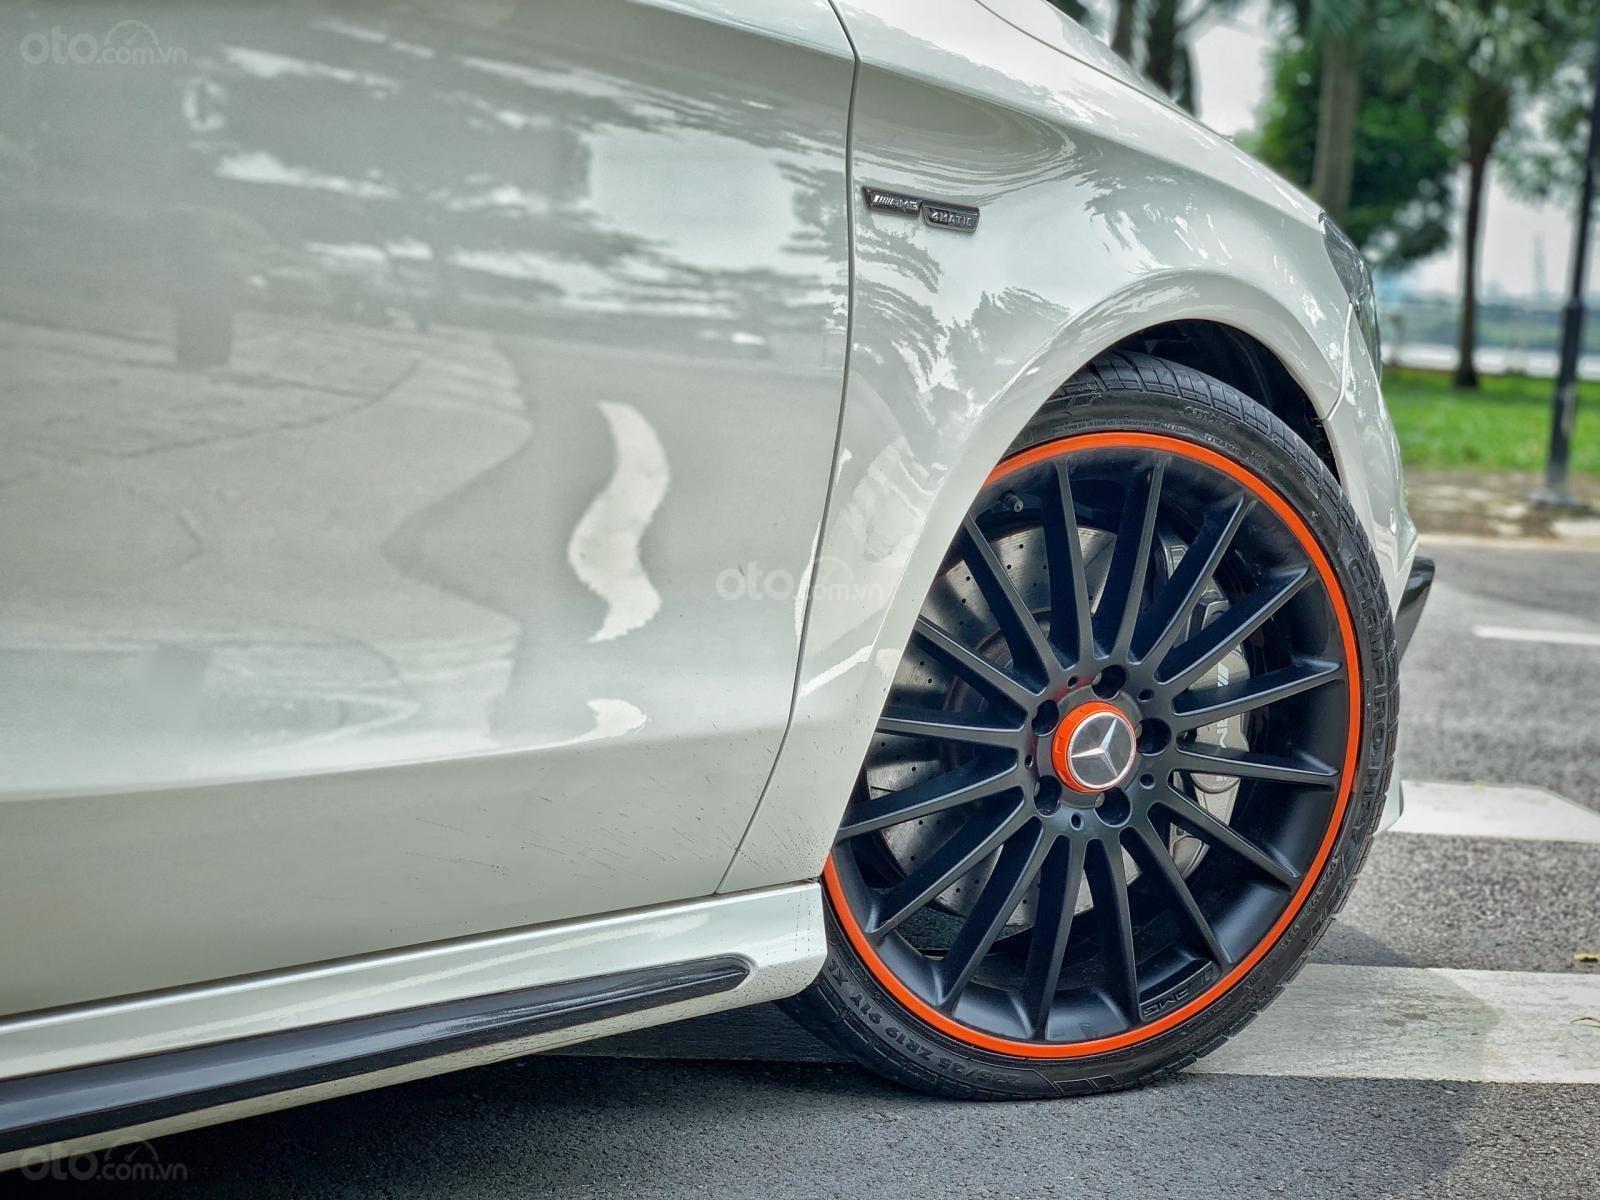 Bán xe Mercedes CLA 45AMG Orange Art đời 2016 full option, giá chỉ 1 tỷ 65 (9)